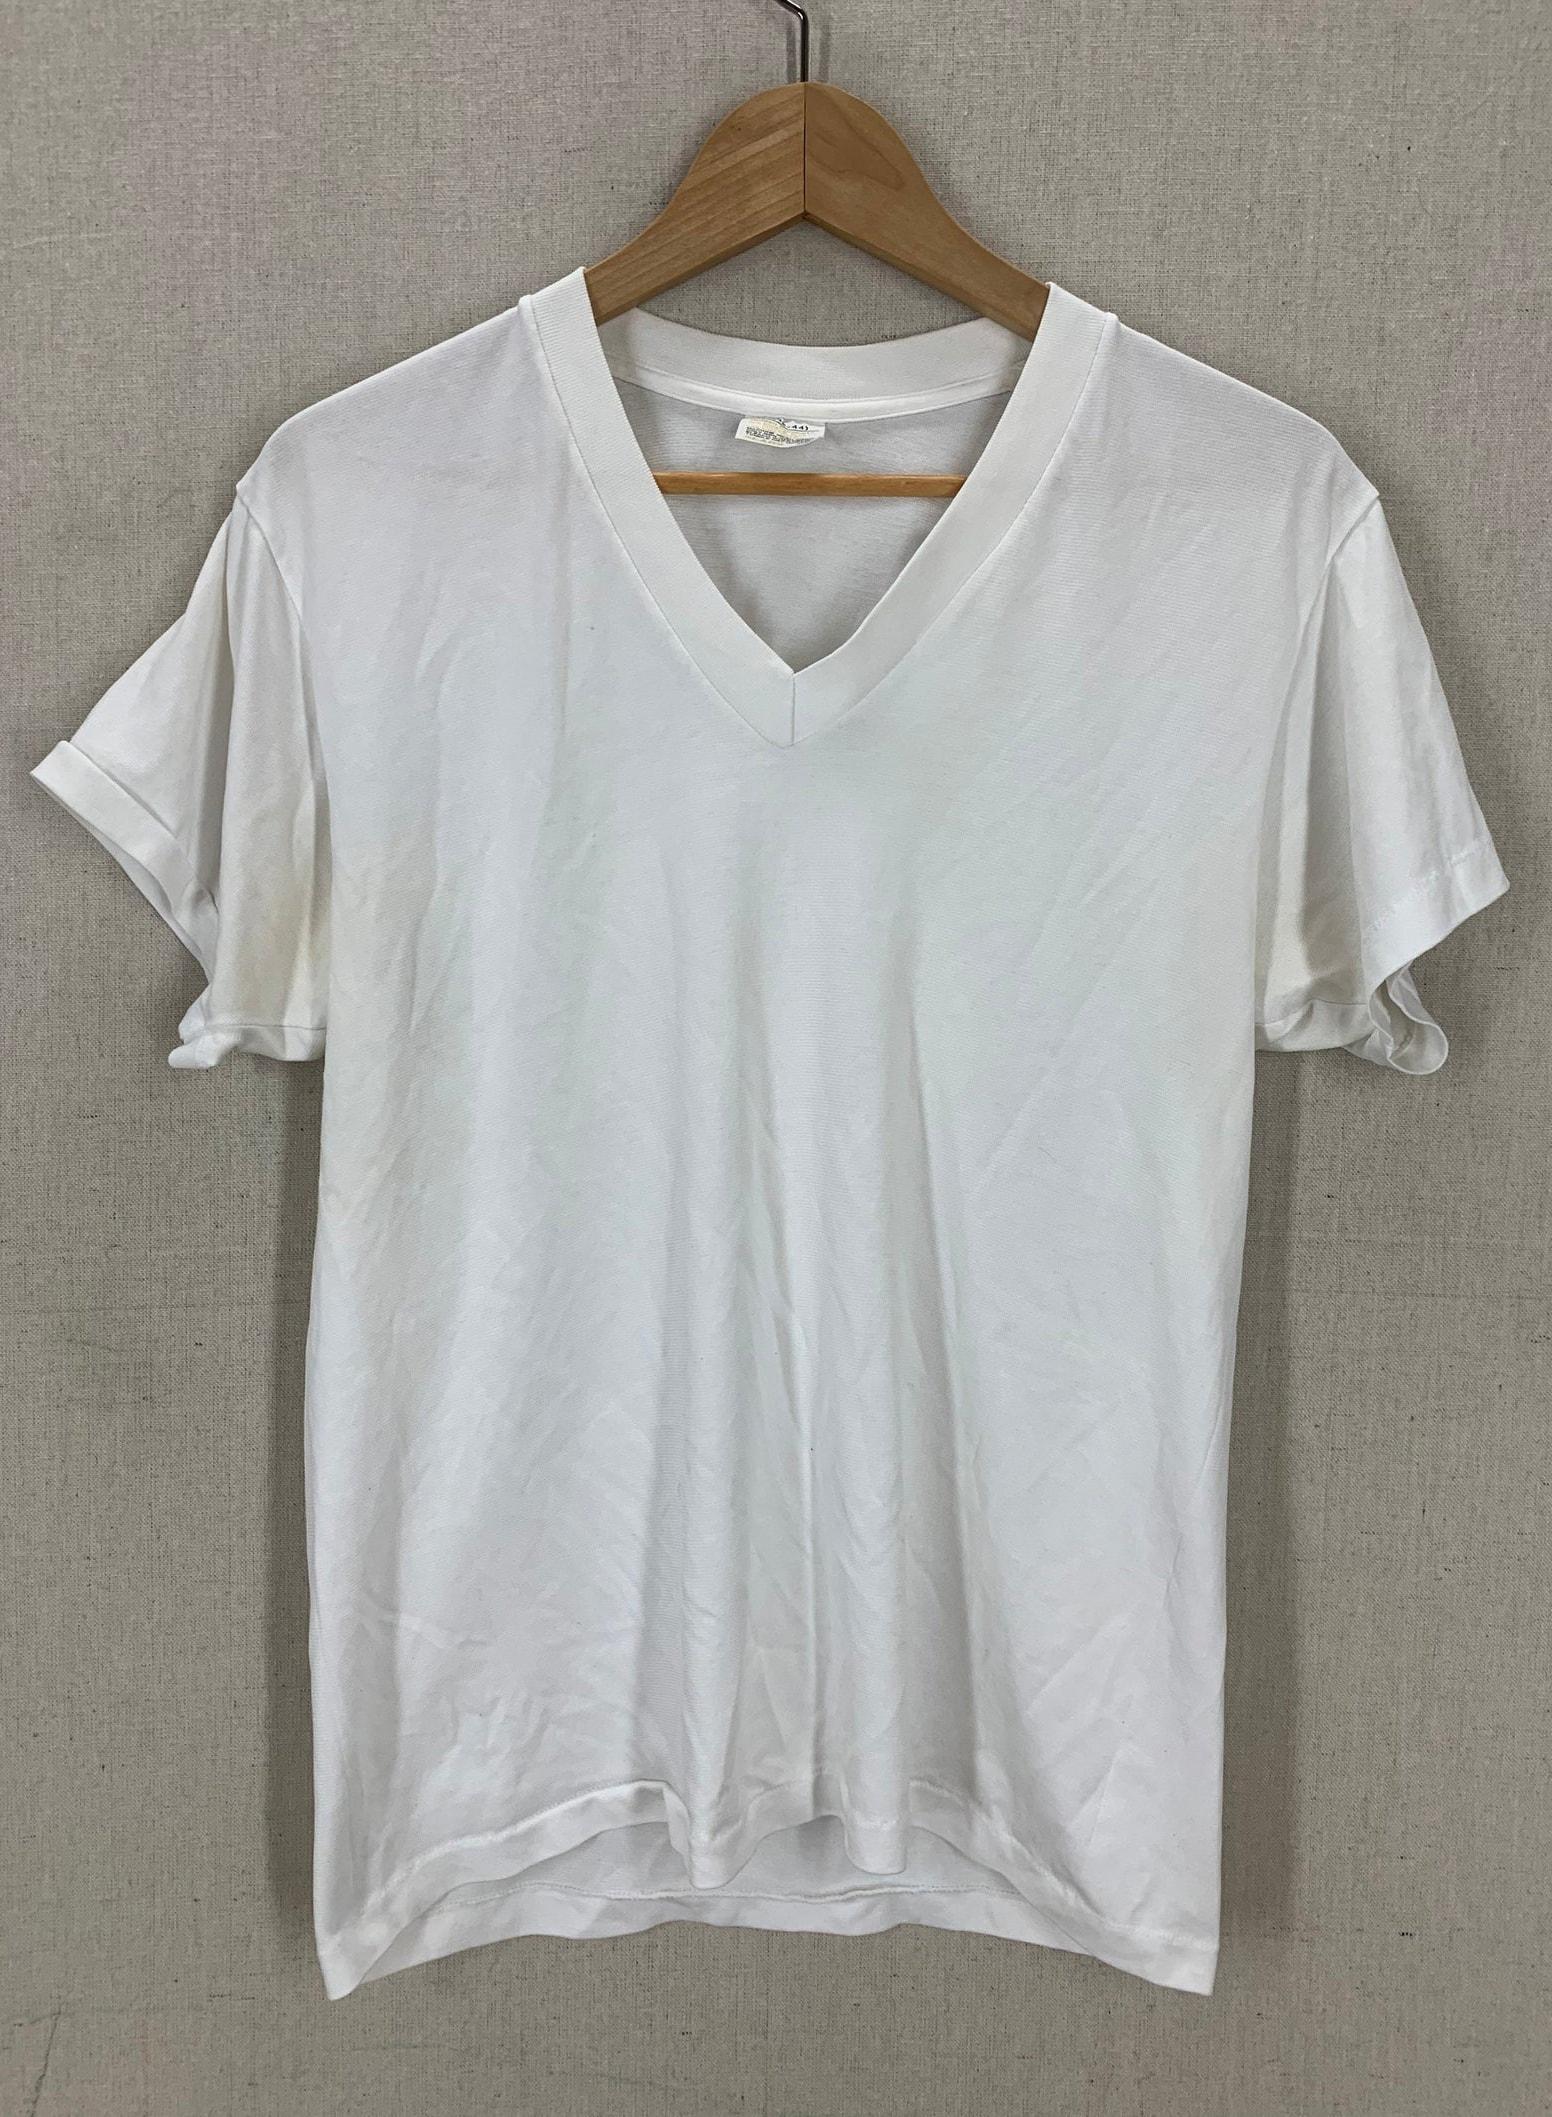 Vintage 80's Blank White Super Soft Thin Distressed T-Shirt M